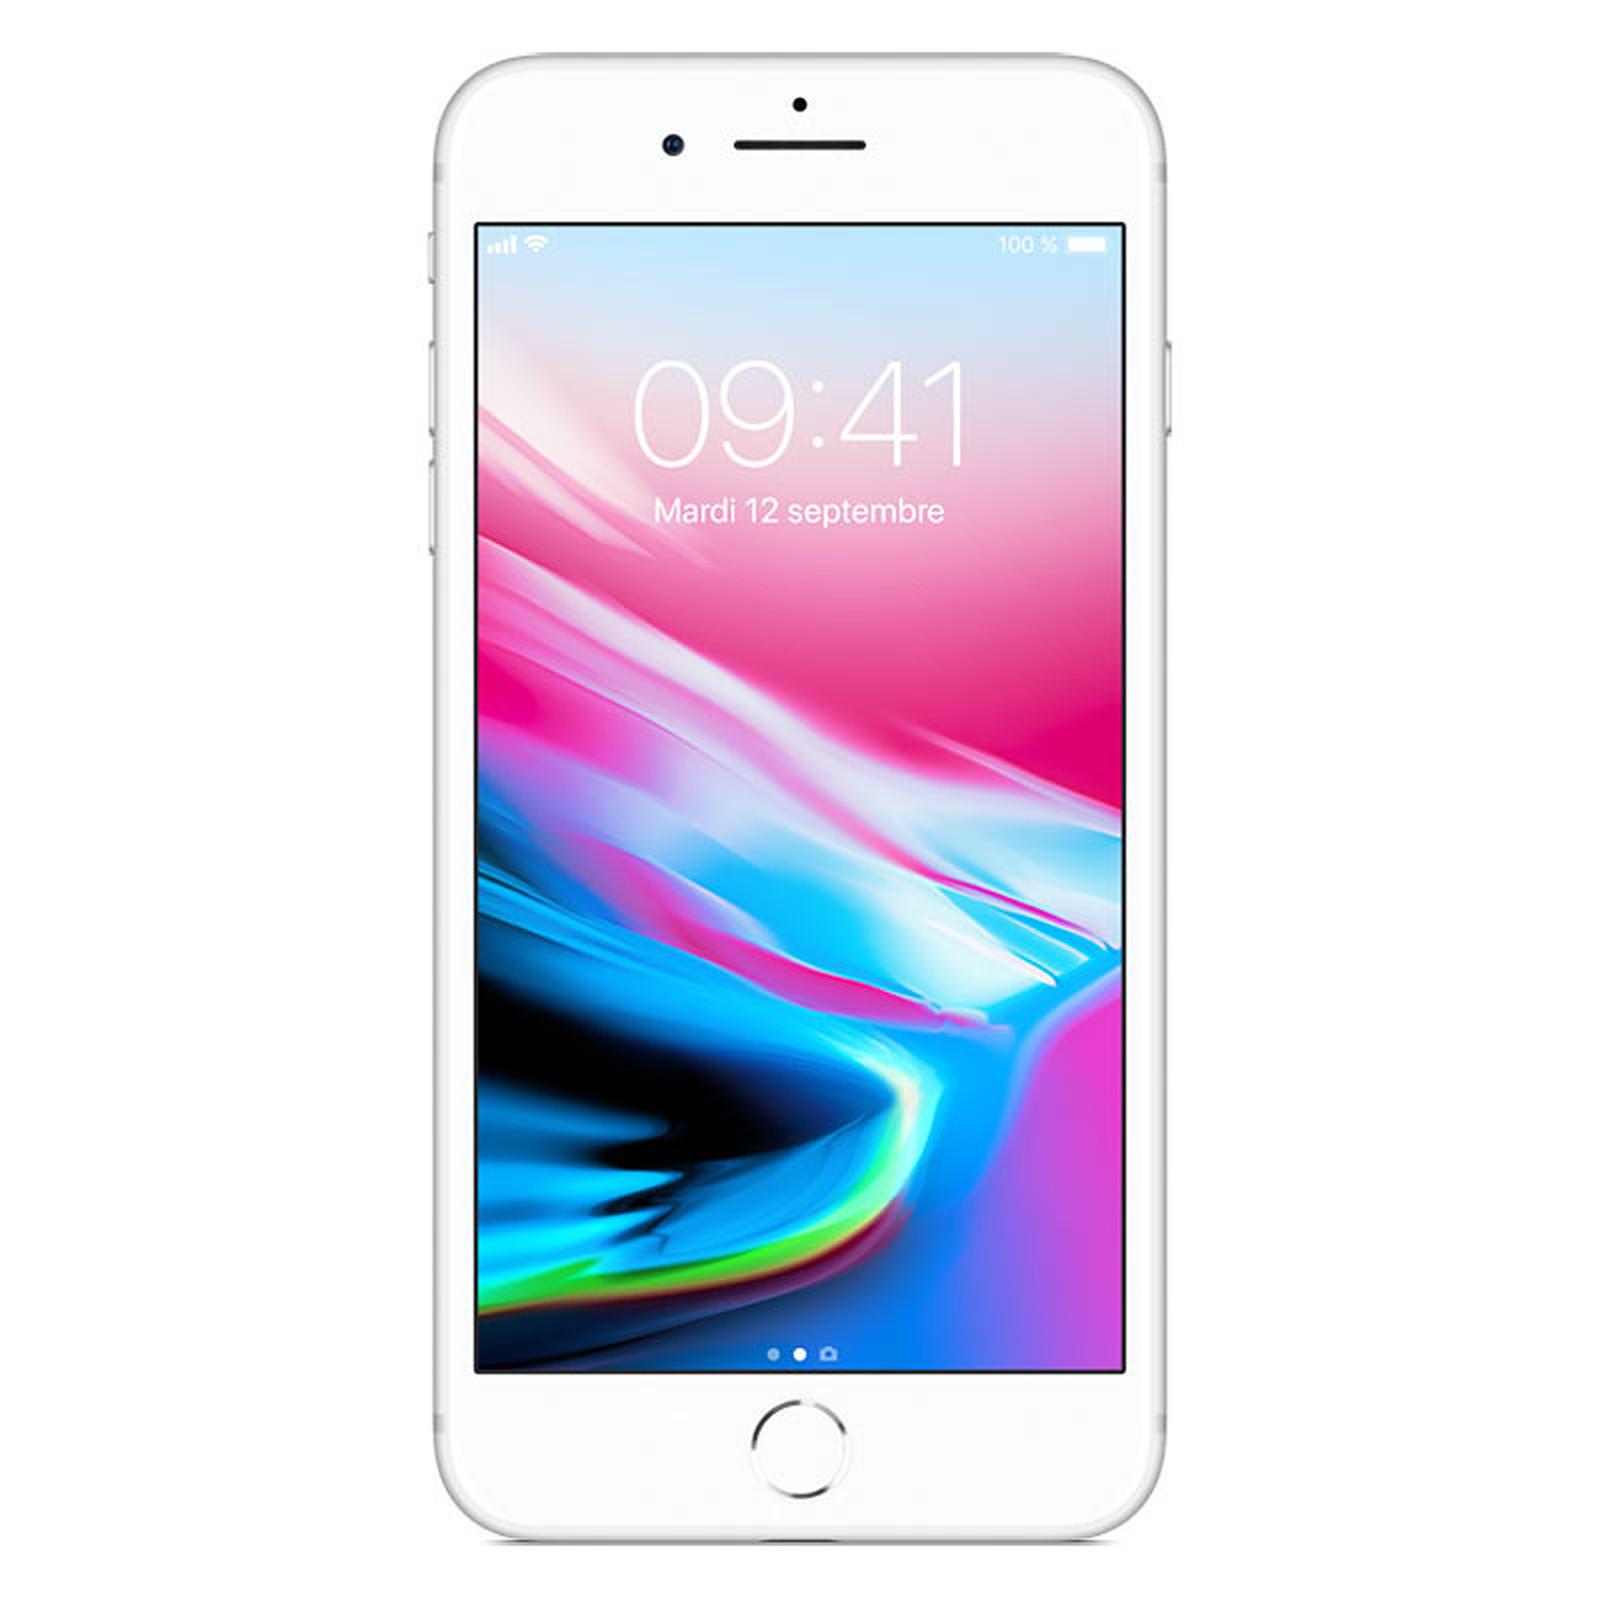 Remade iPhone 8 Plus 256 GB Silver (Grado A+)